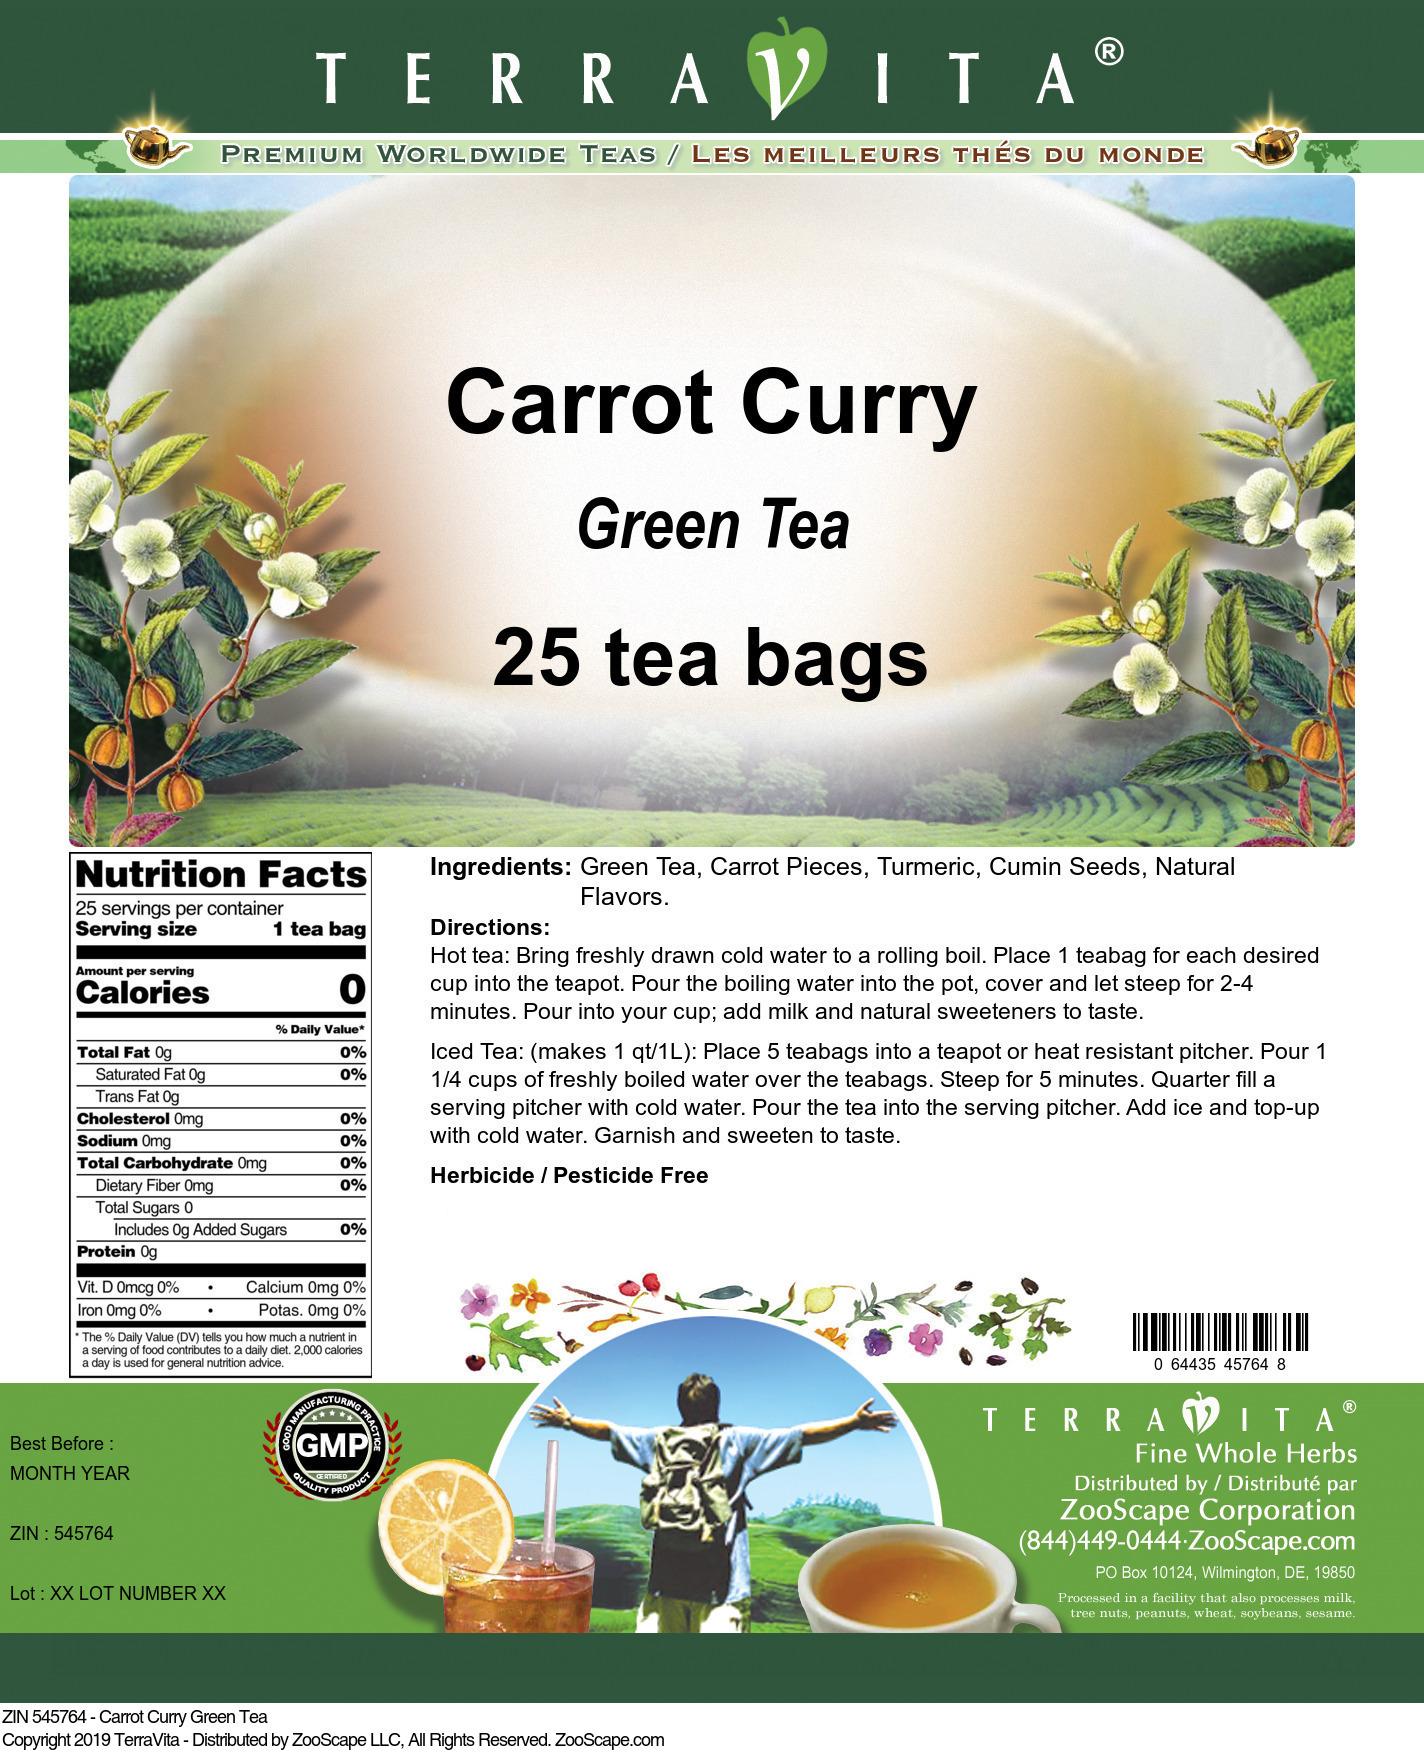 Carrot Curry Green Tea